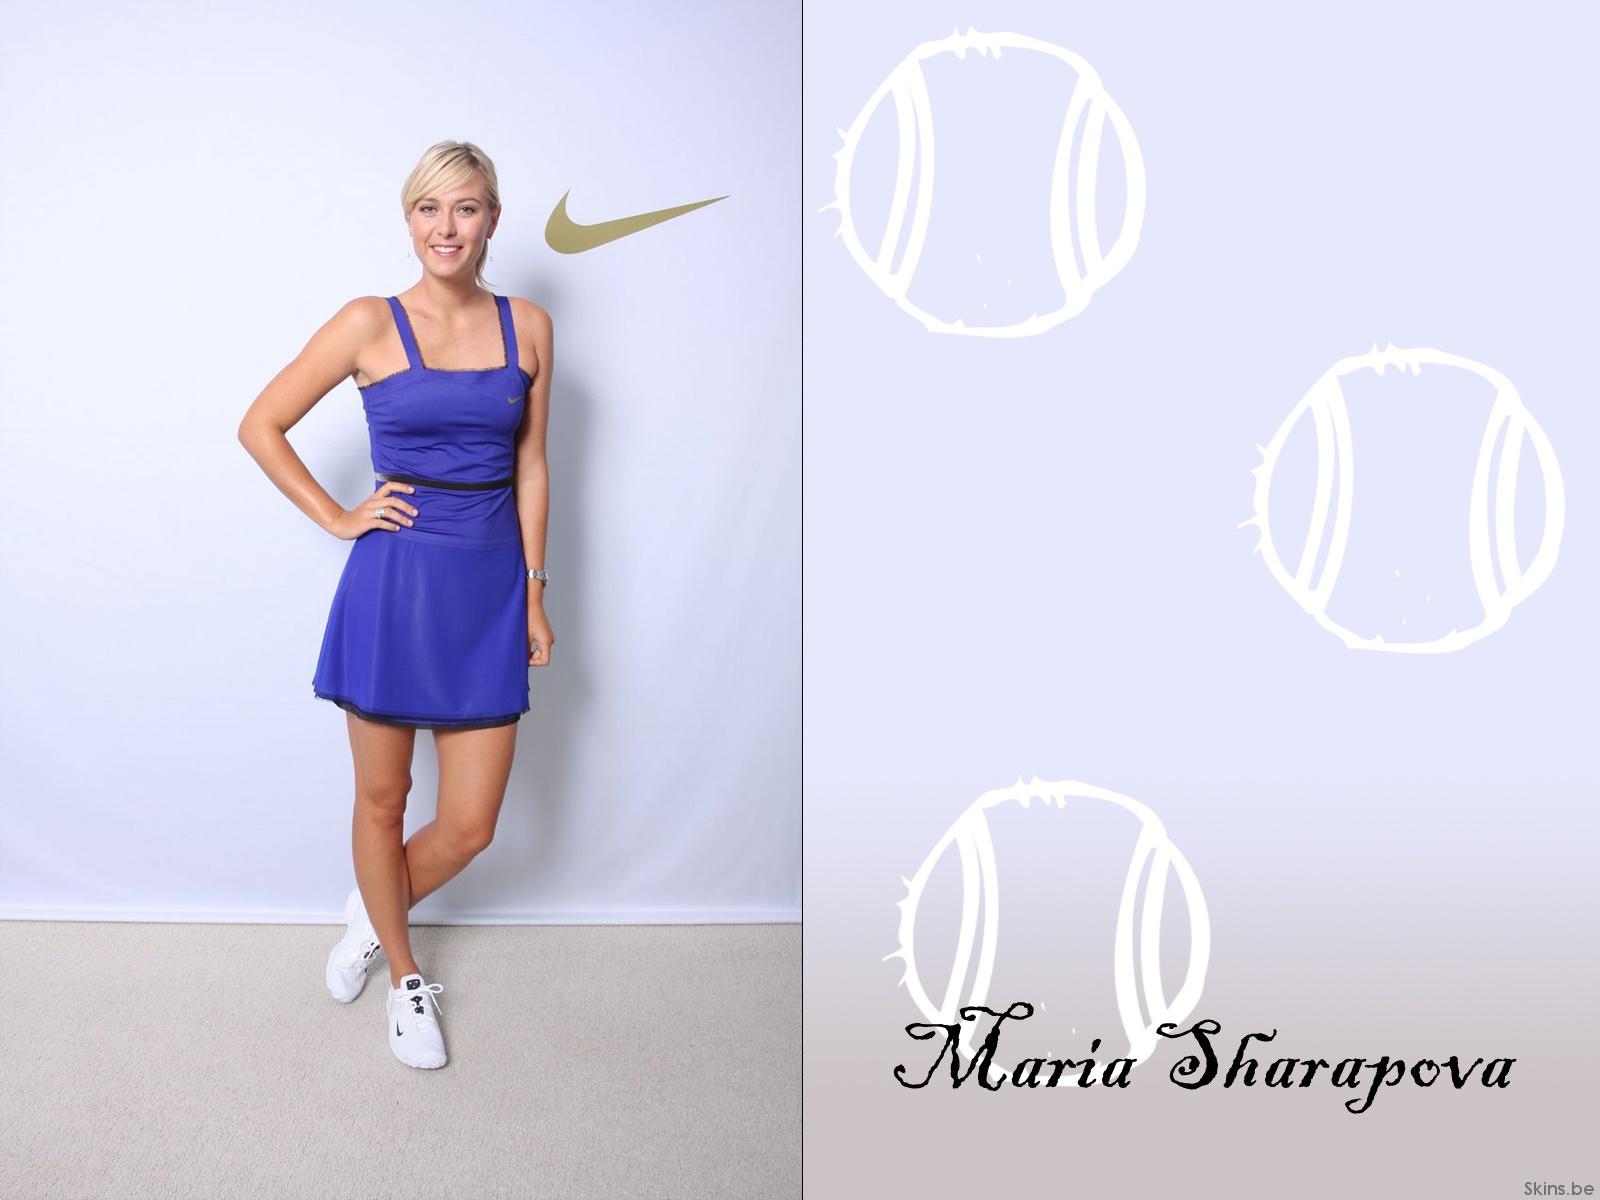 http://3.bp.blogspot.com/-EiYa7wYx8qY/TZjGhVpCheI/AAAAAAAABNc/zLT2uXJgEZM/s1600/Maria+Sharapova+%252849%2529.jpg